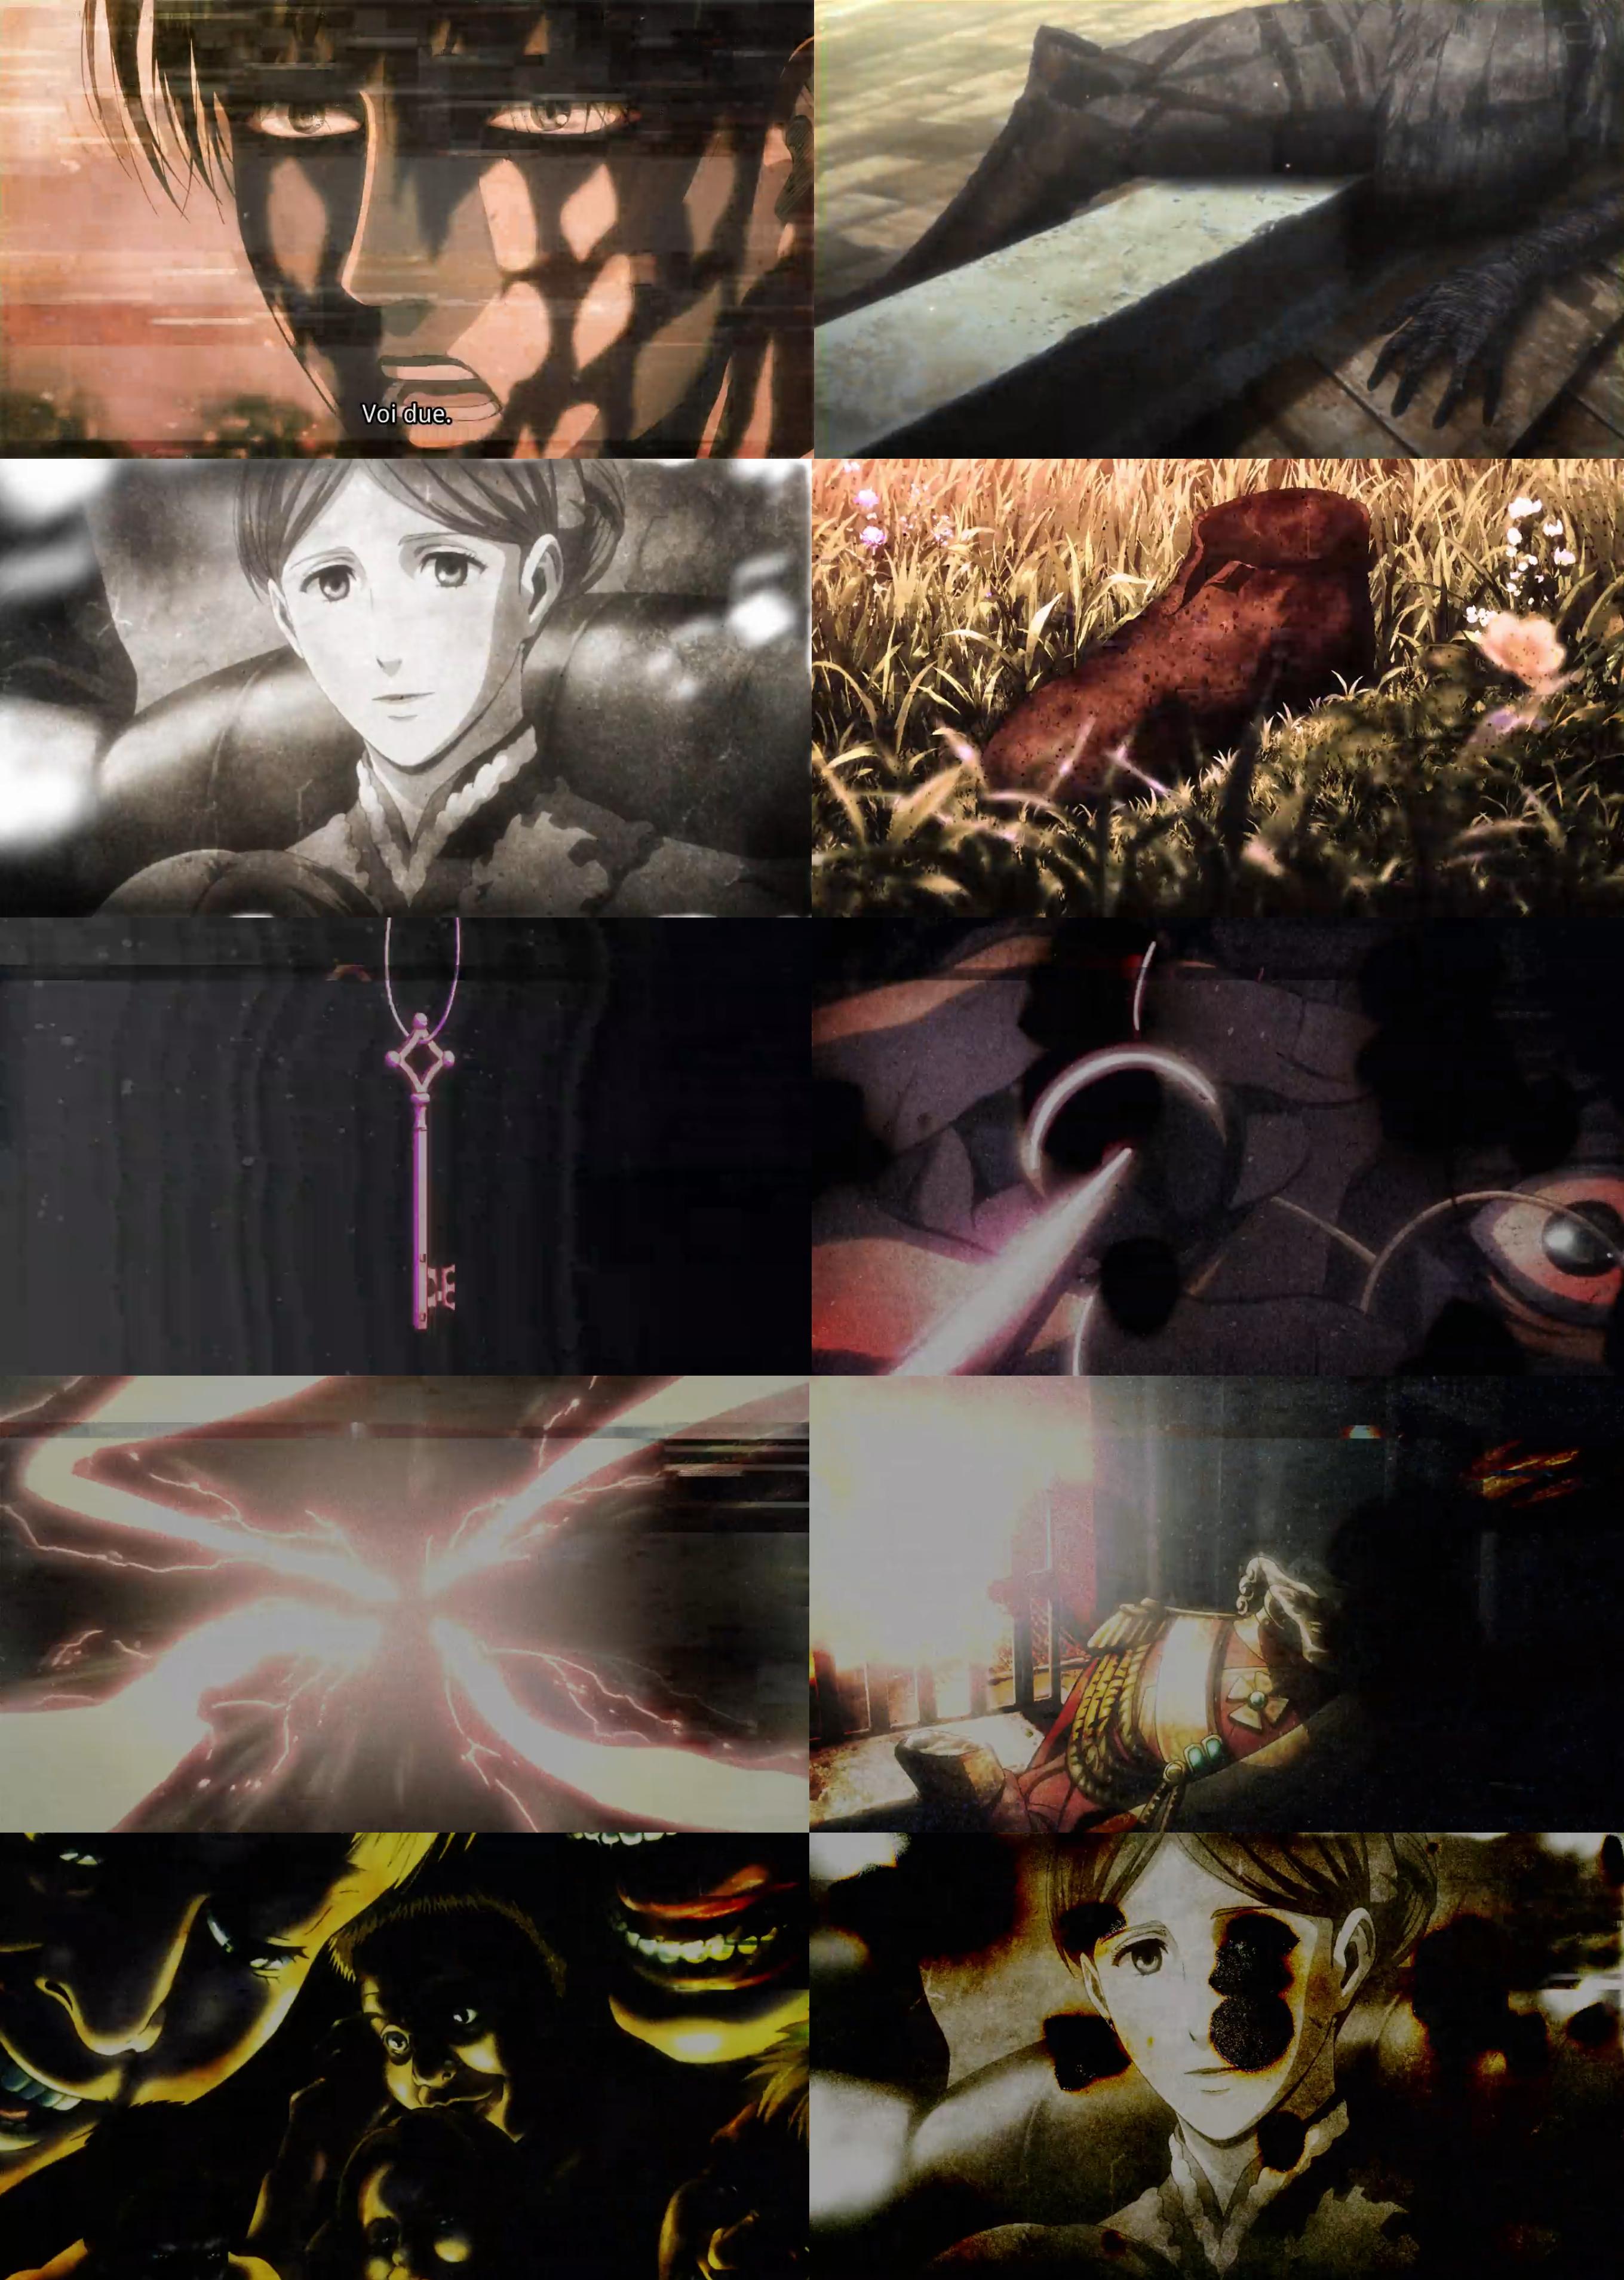 Attack on Titan season 3 ep.12 ending surprise part 1